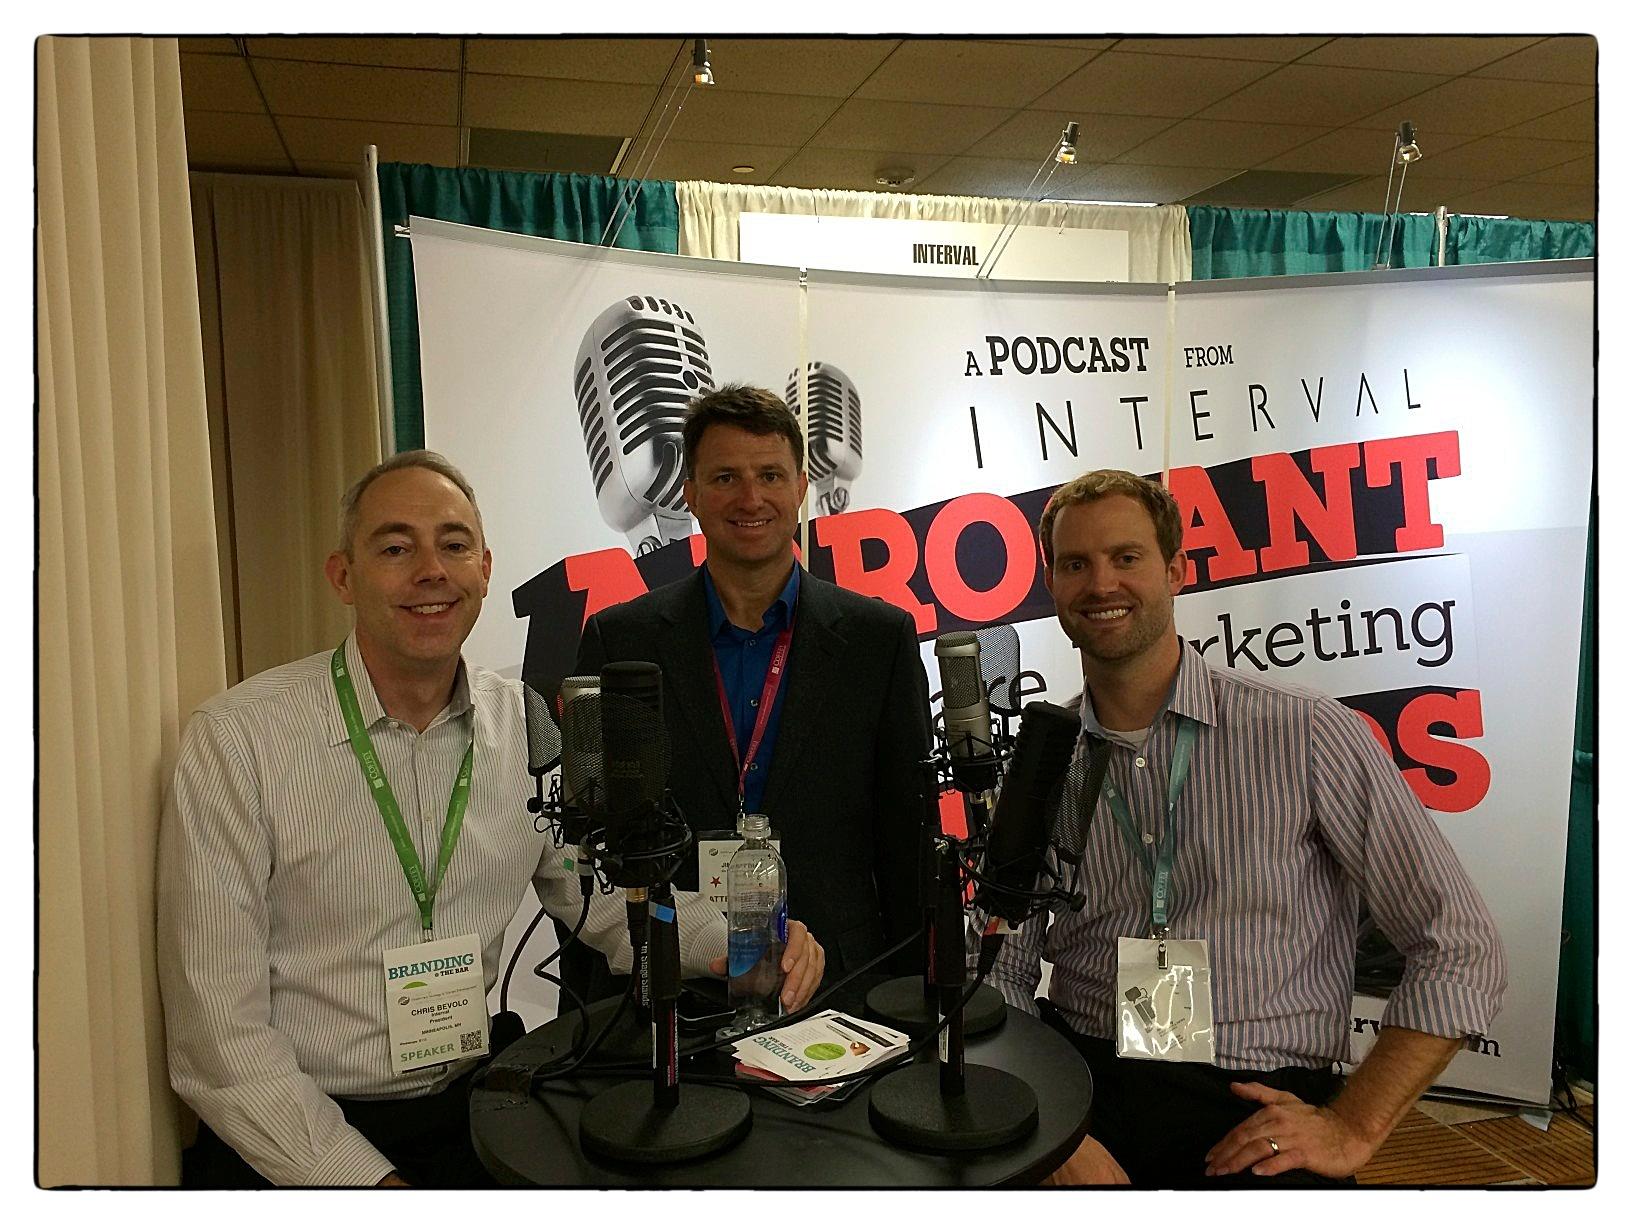 Three Arrogant Healthcare Marketing Bastards at SHSMD: Chris Bevolo, Jim Rattray and Robert Prevost.